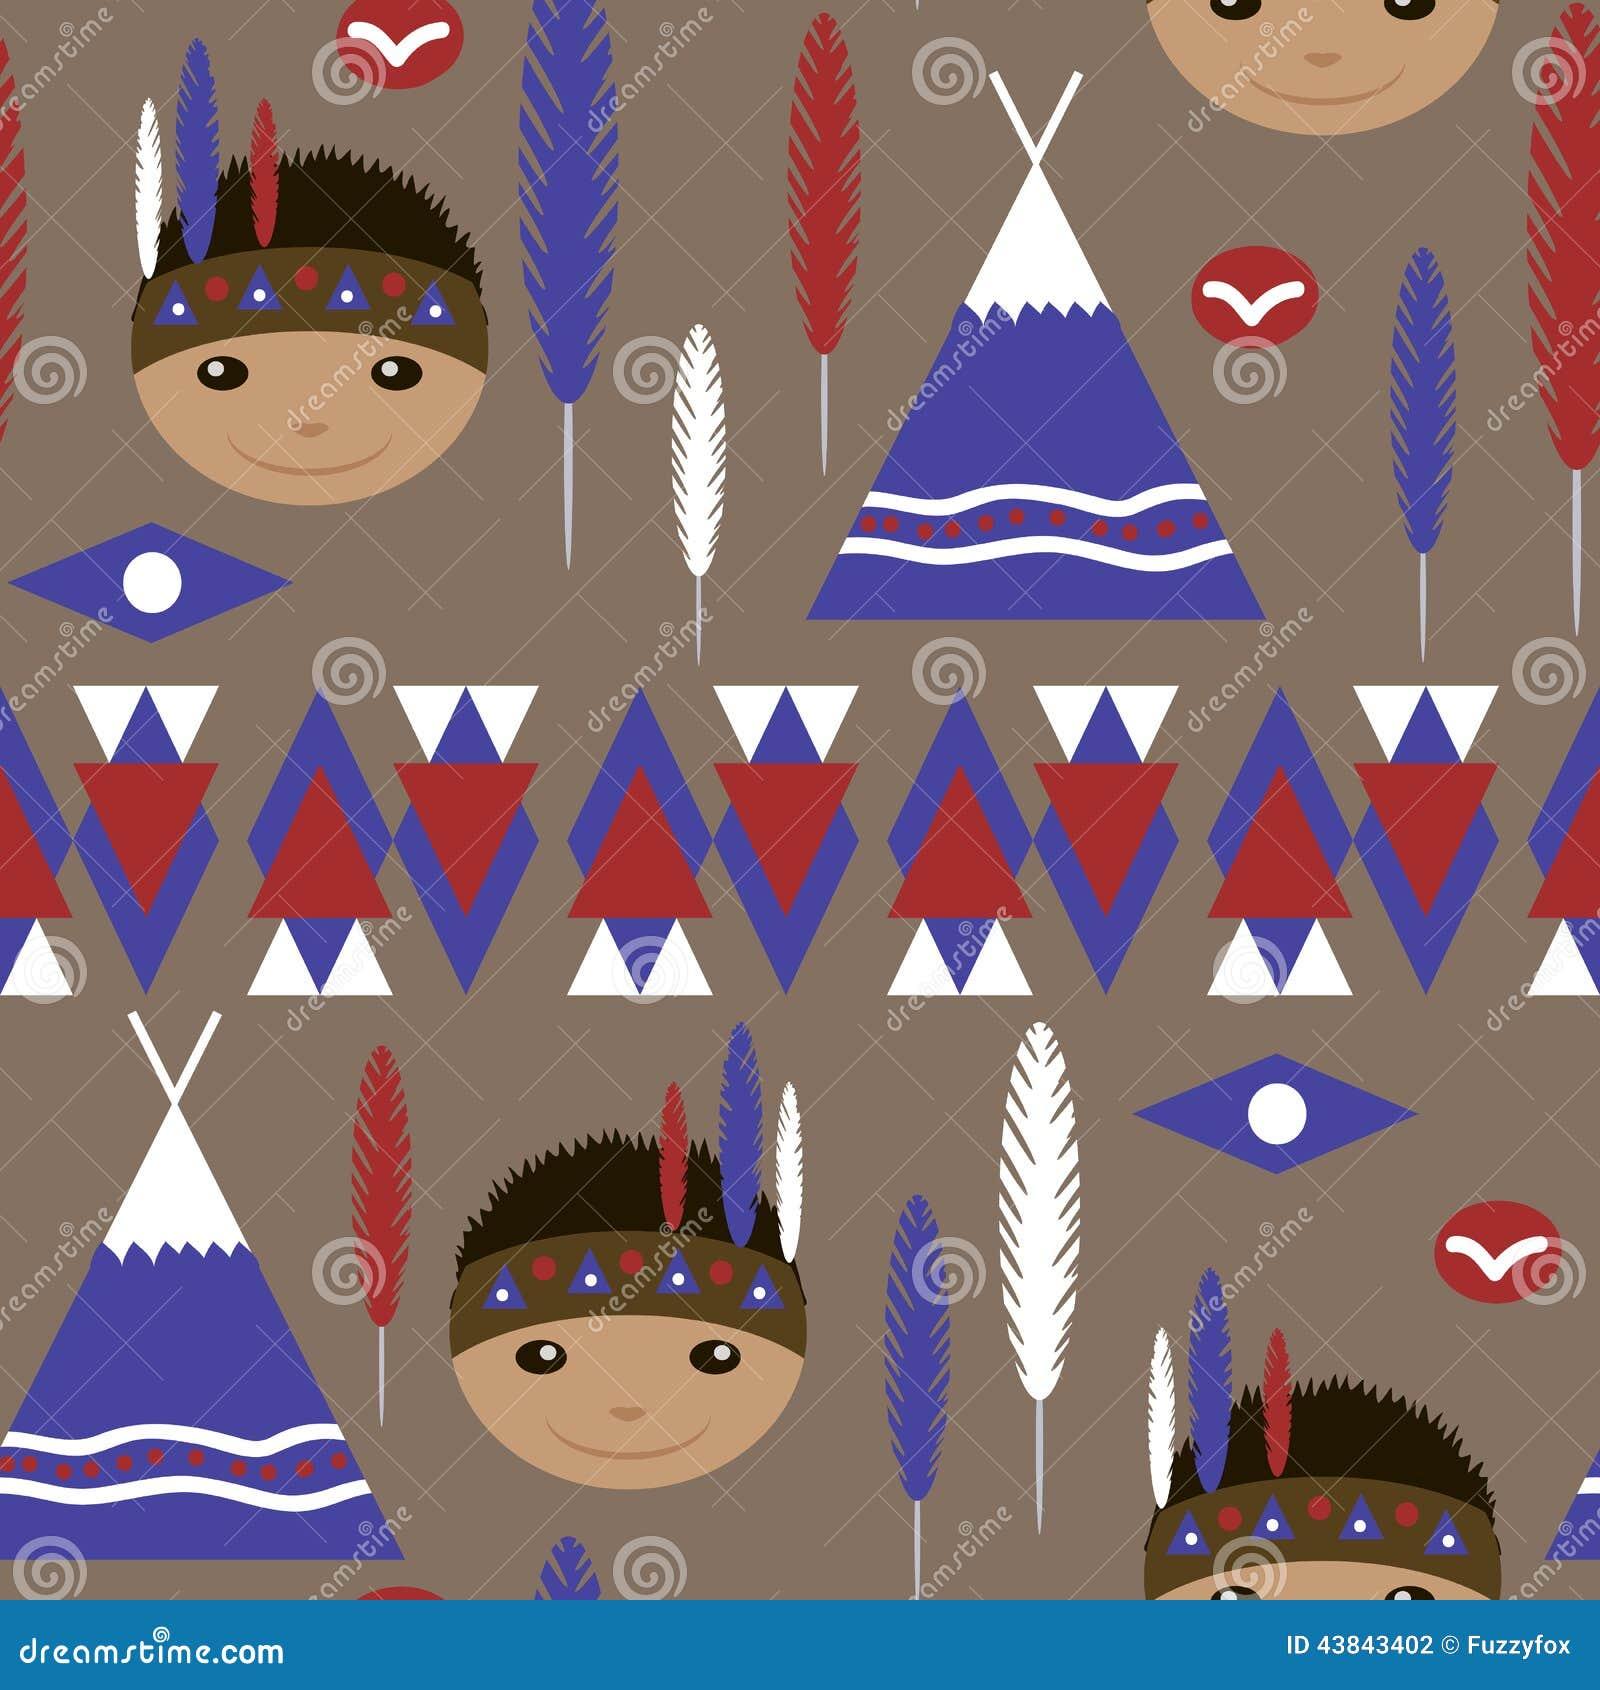 Seamless Kids Cute American Indian Native Retro Pattern